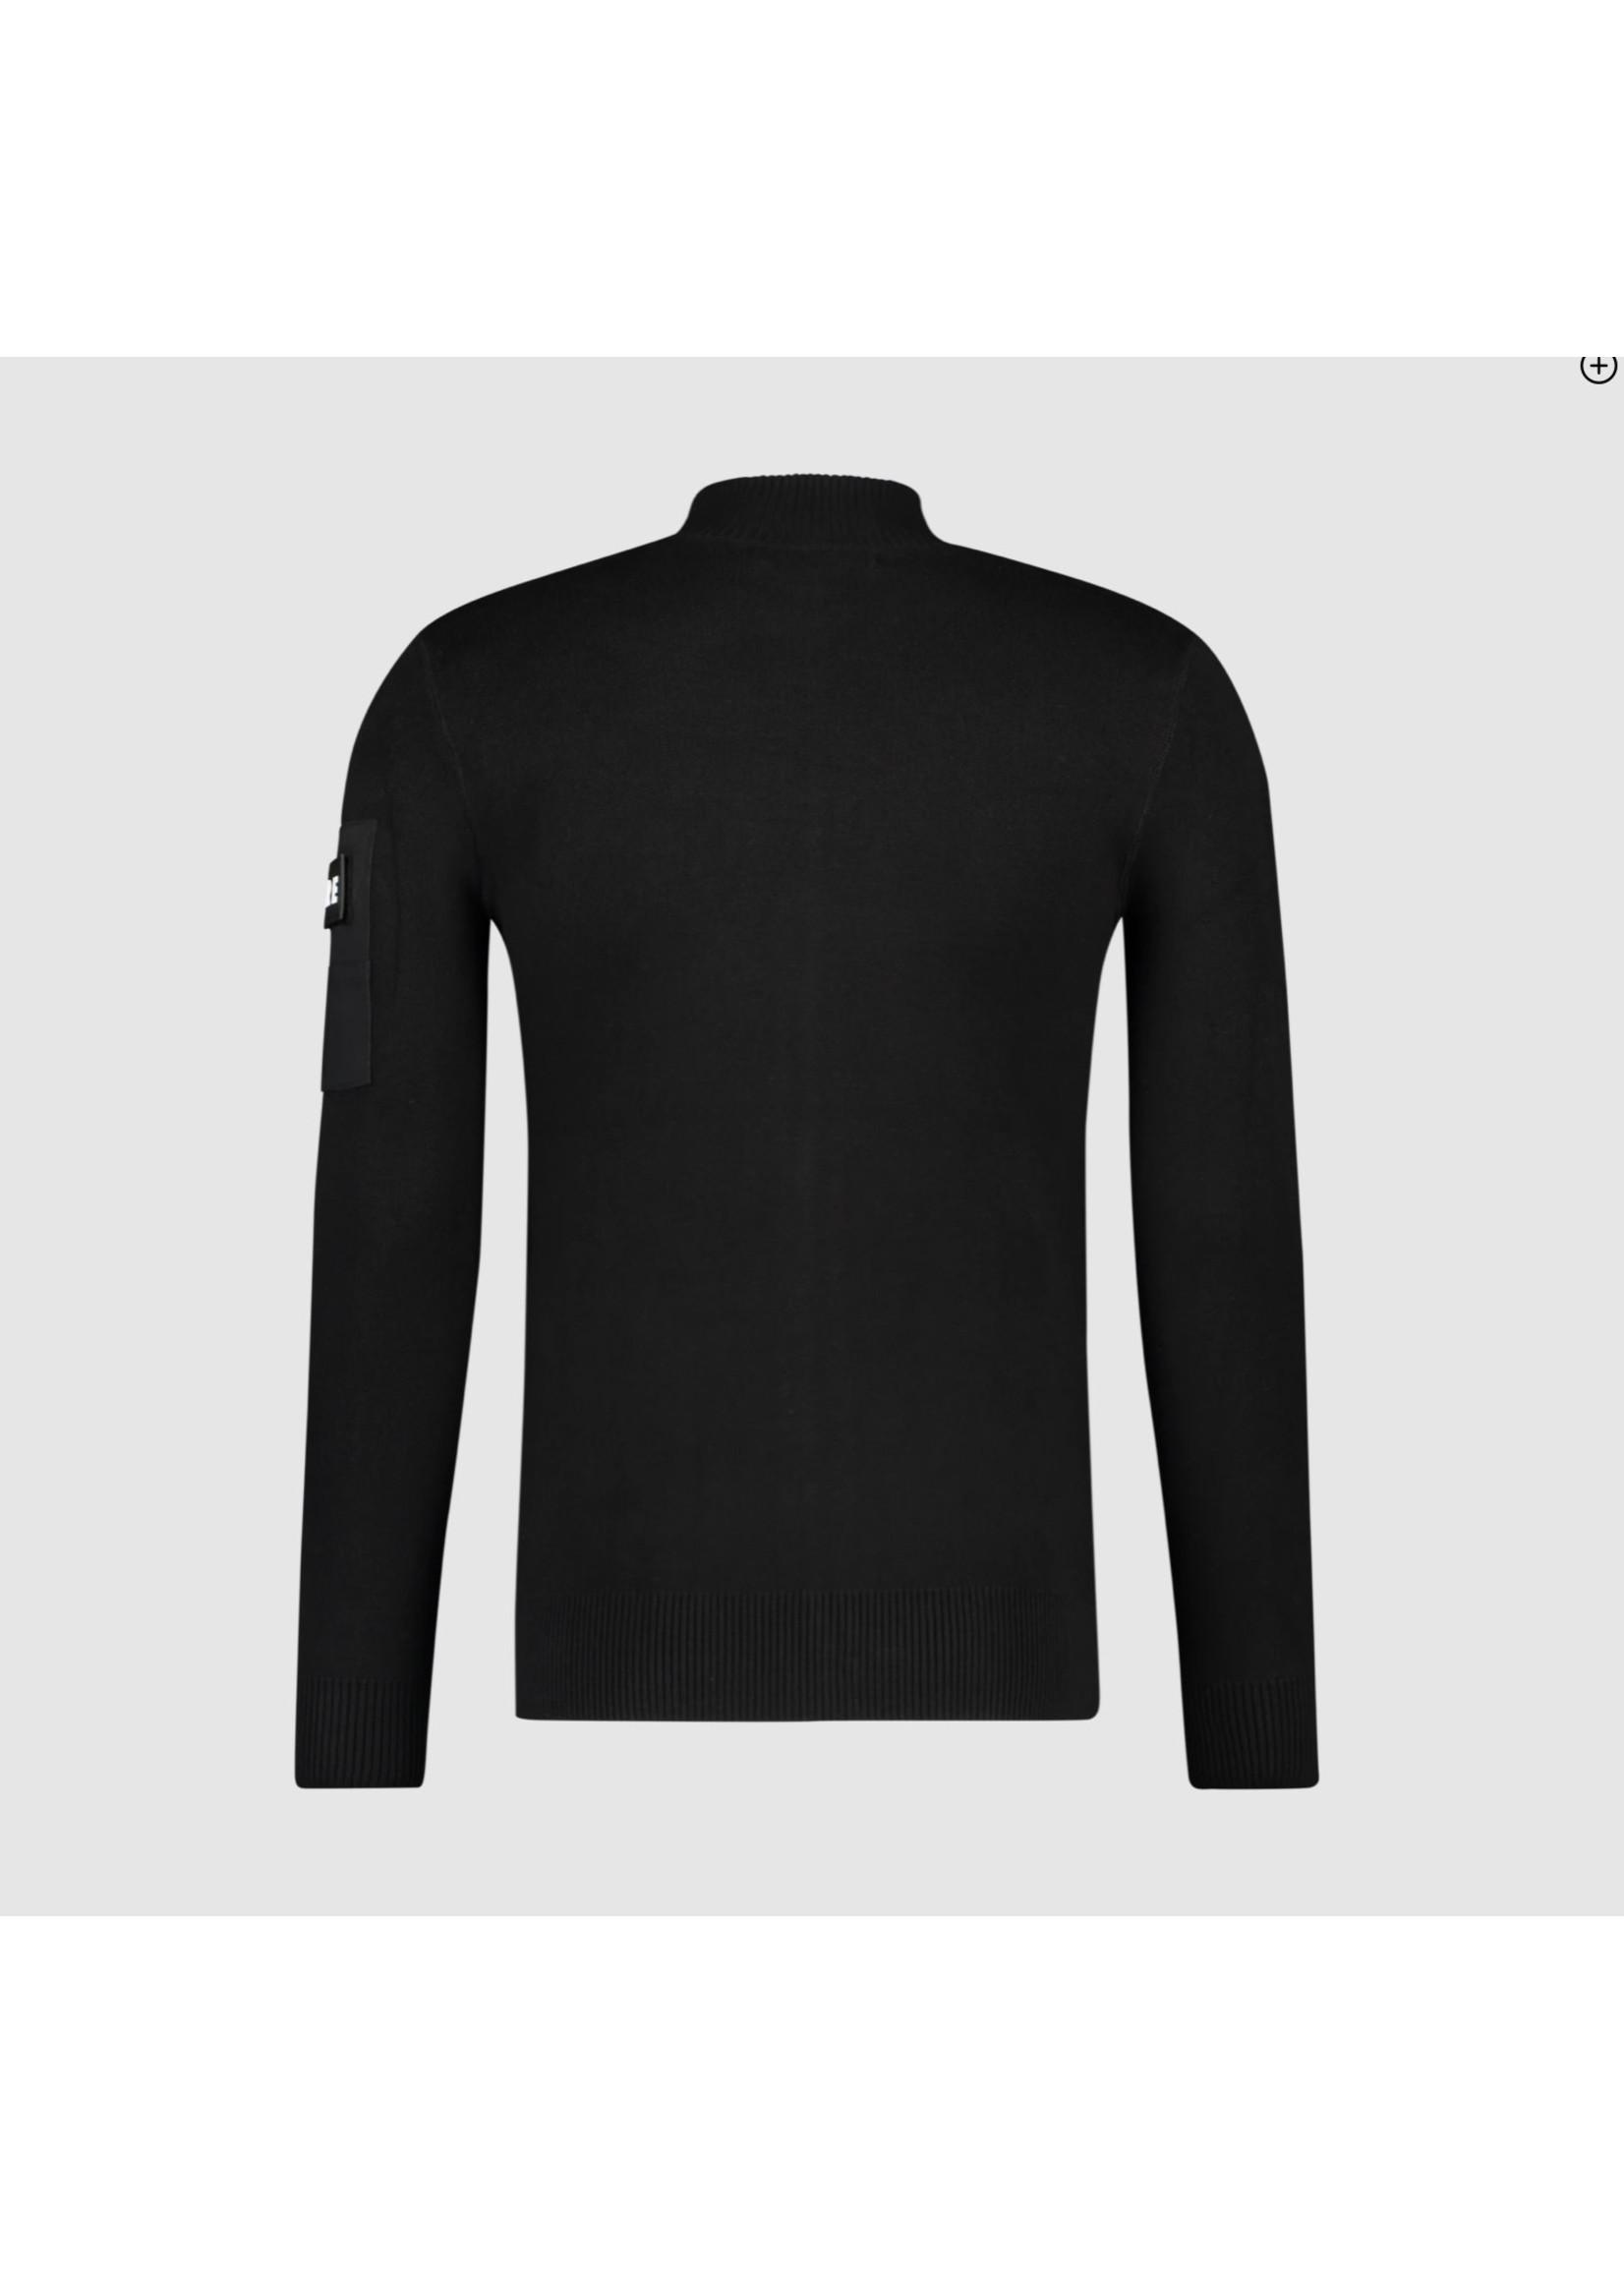 Purewhite Purewhite Knitted Cardigan - Black